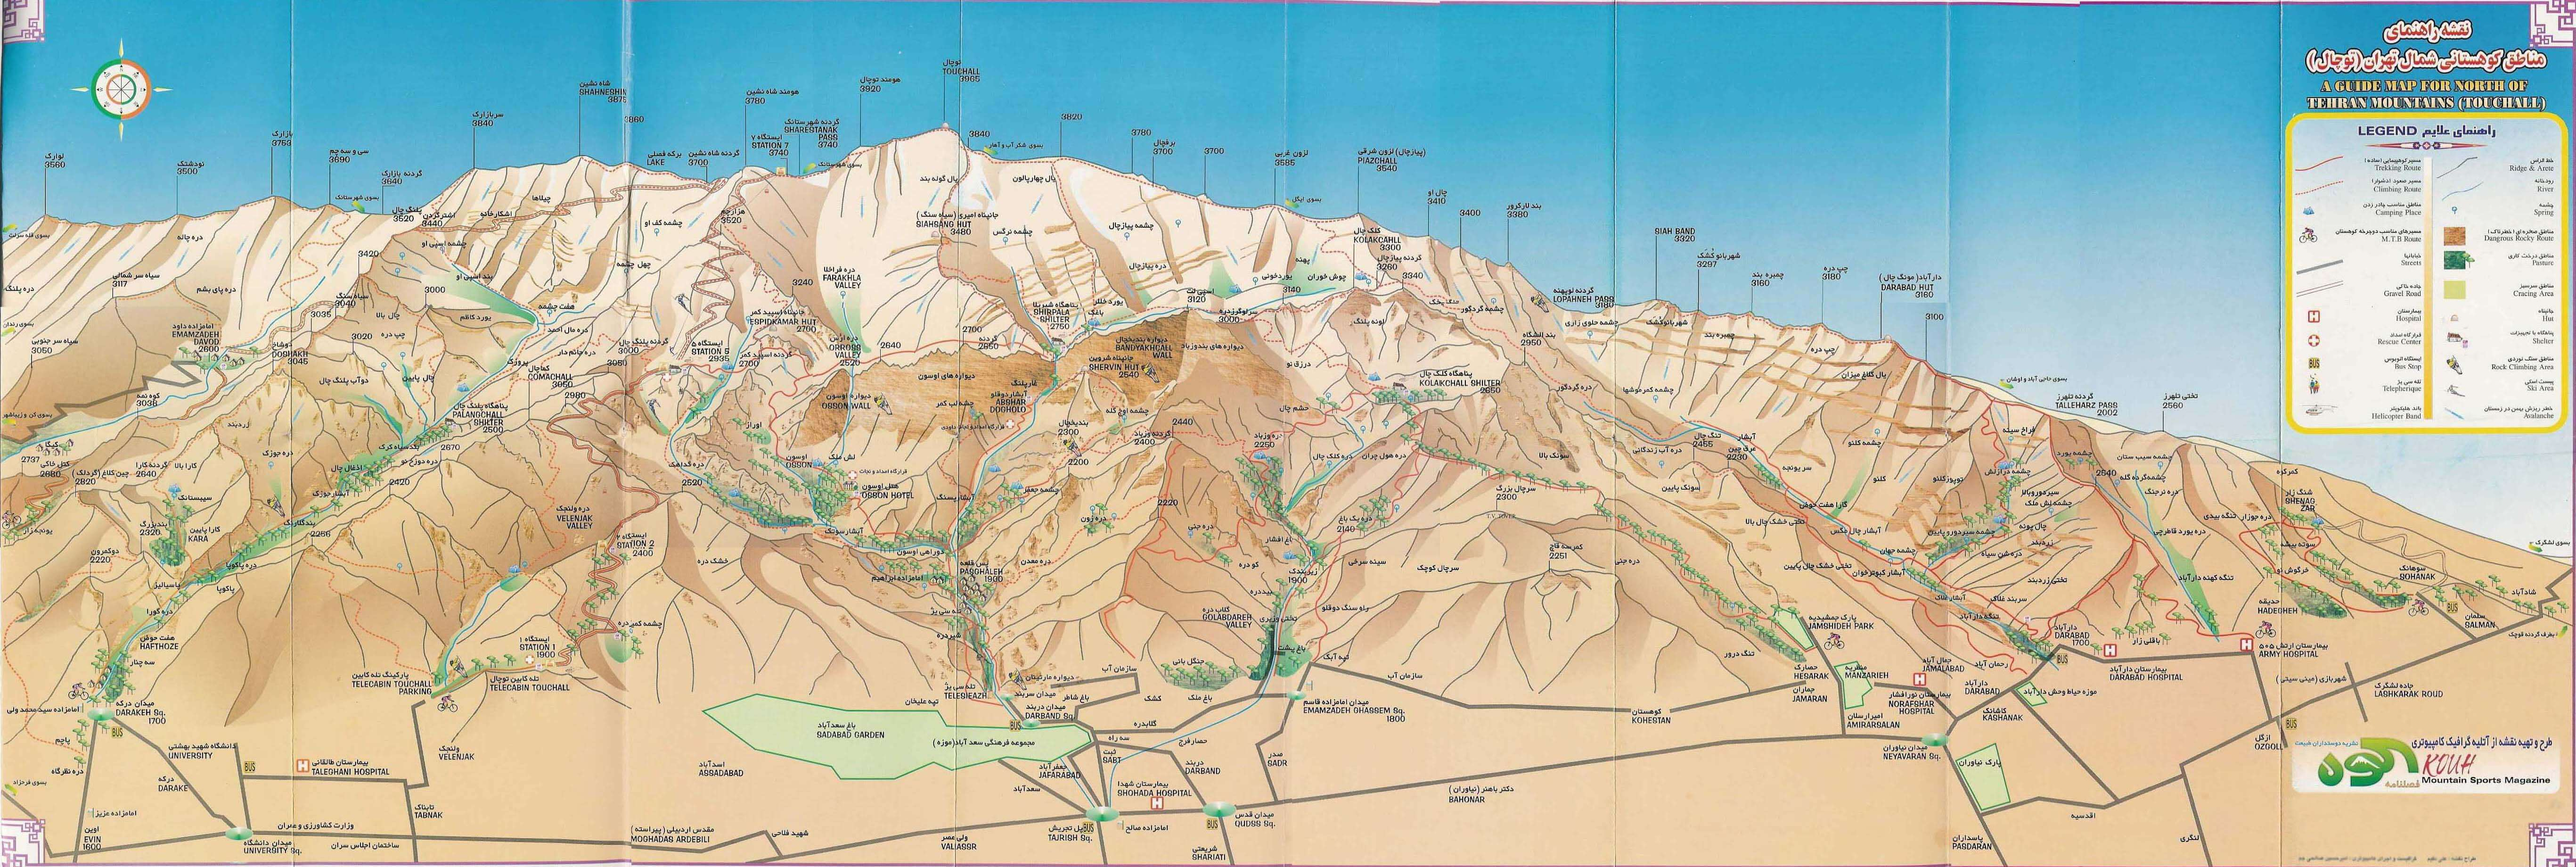 Tochal mountain map tehran iran mountain trekking tour iran travel guide attractions things to do destinations Cheetah adventures